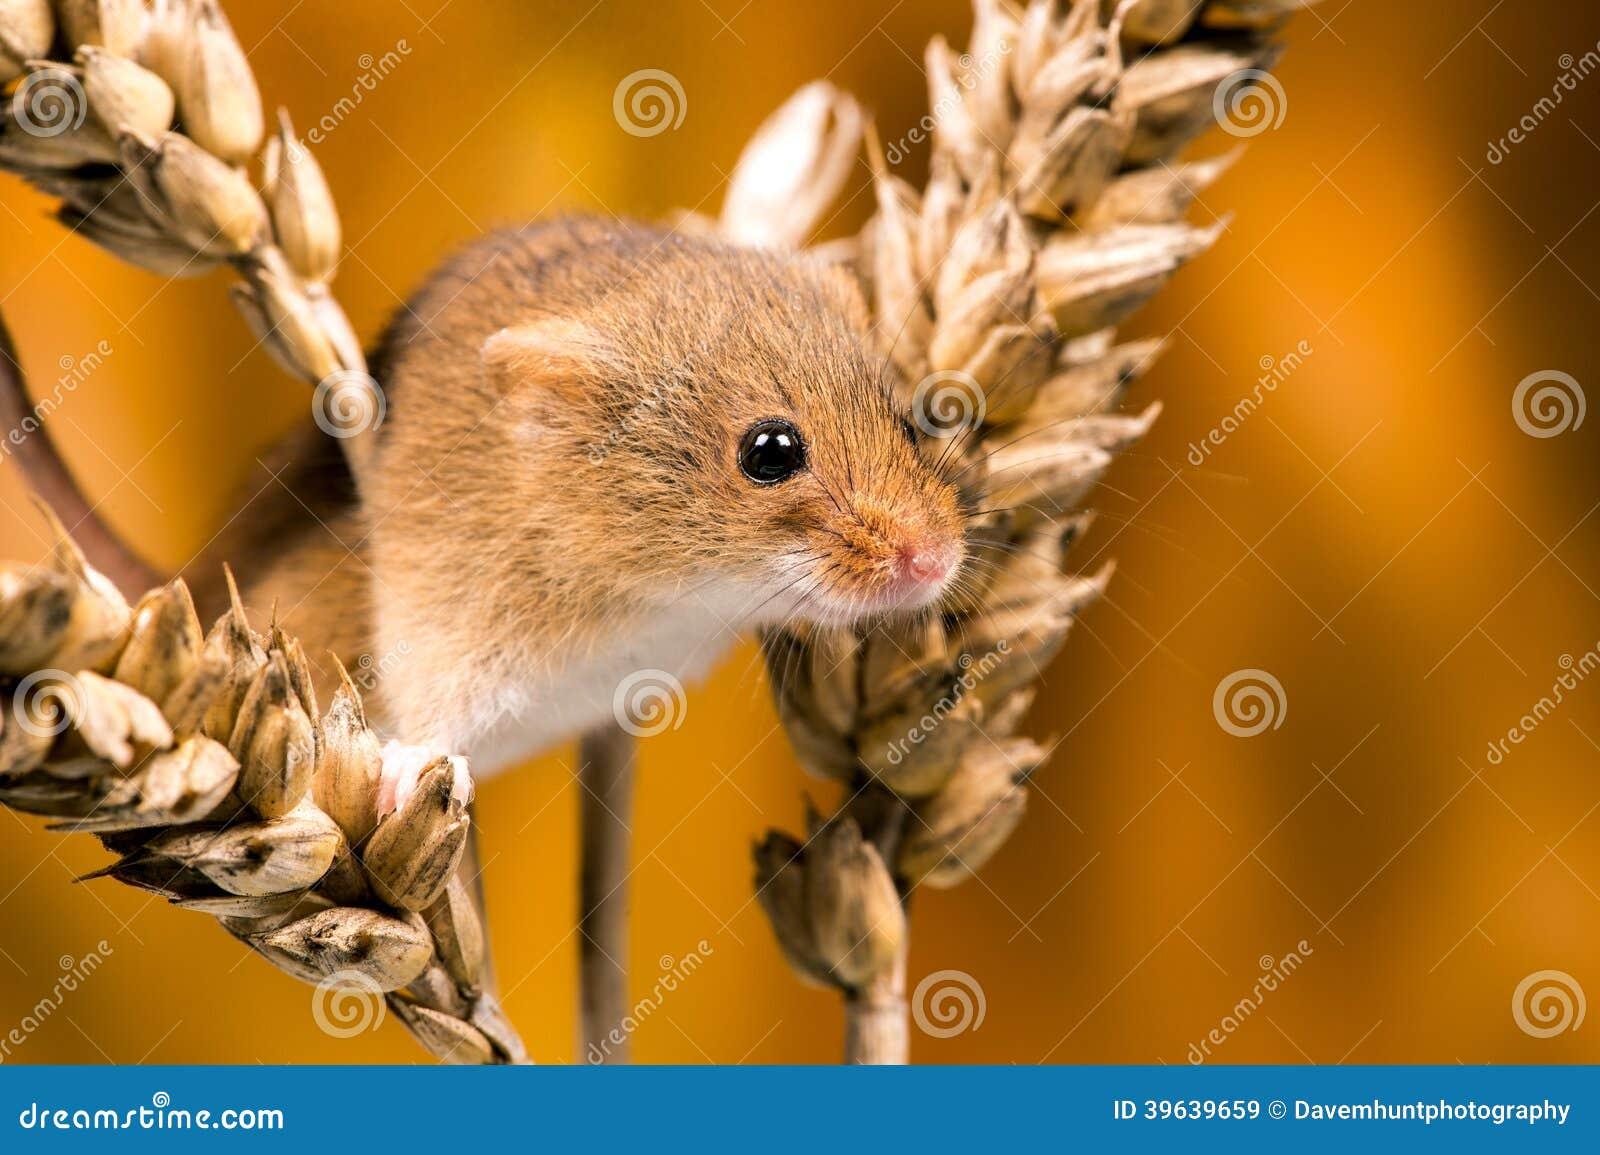 Rato de campo